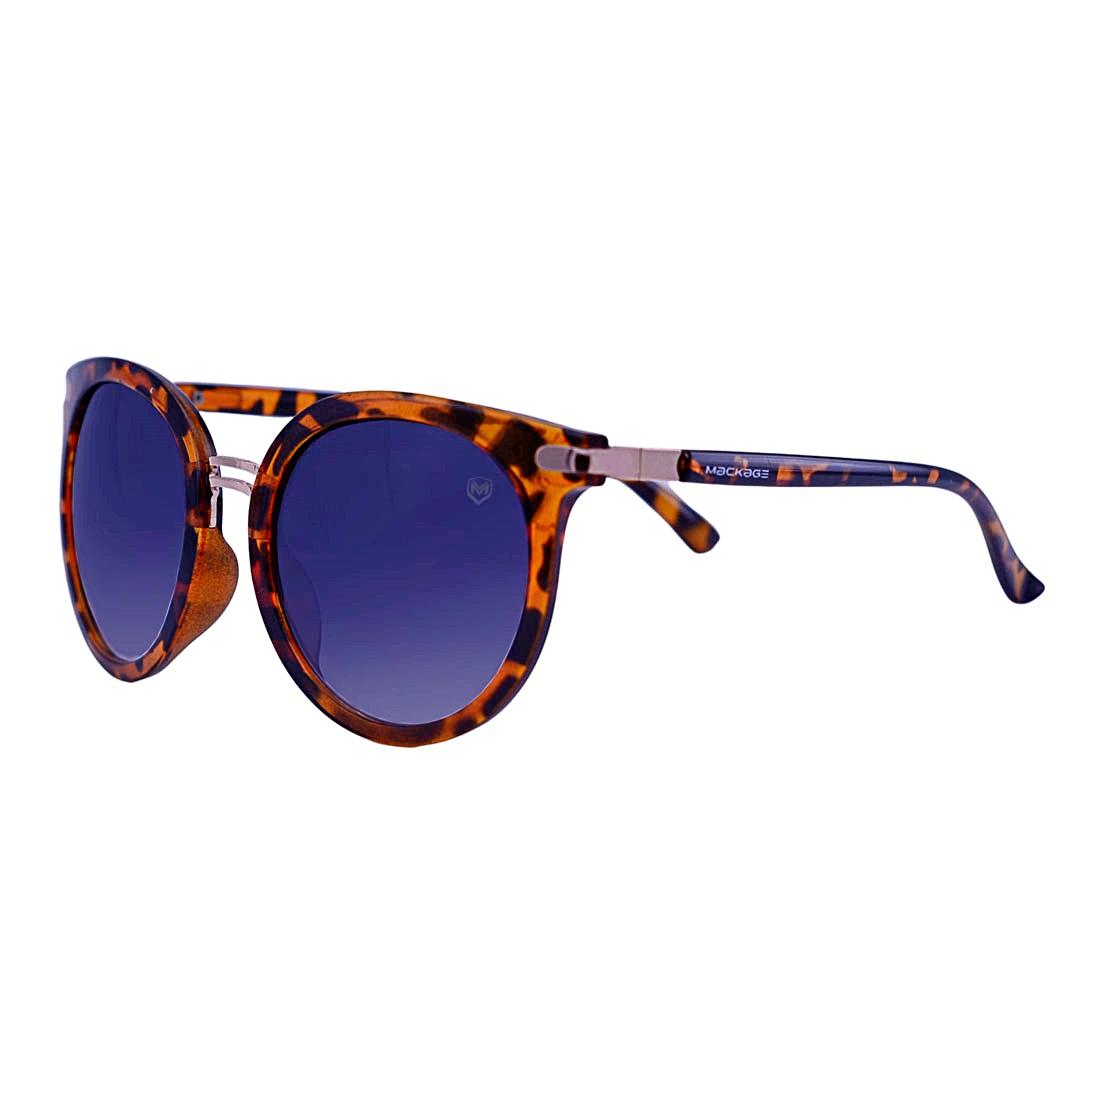 Óculos De Sol Mackage Feminino Acetato Redondo - Tartaruga